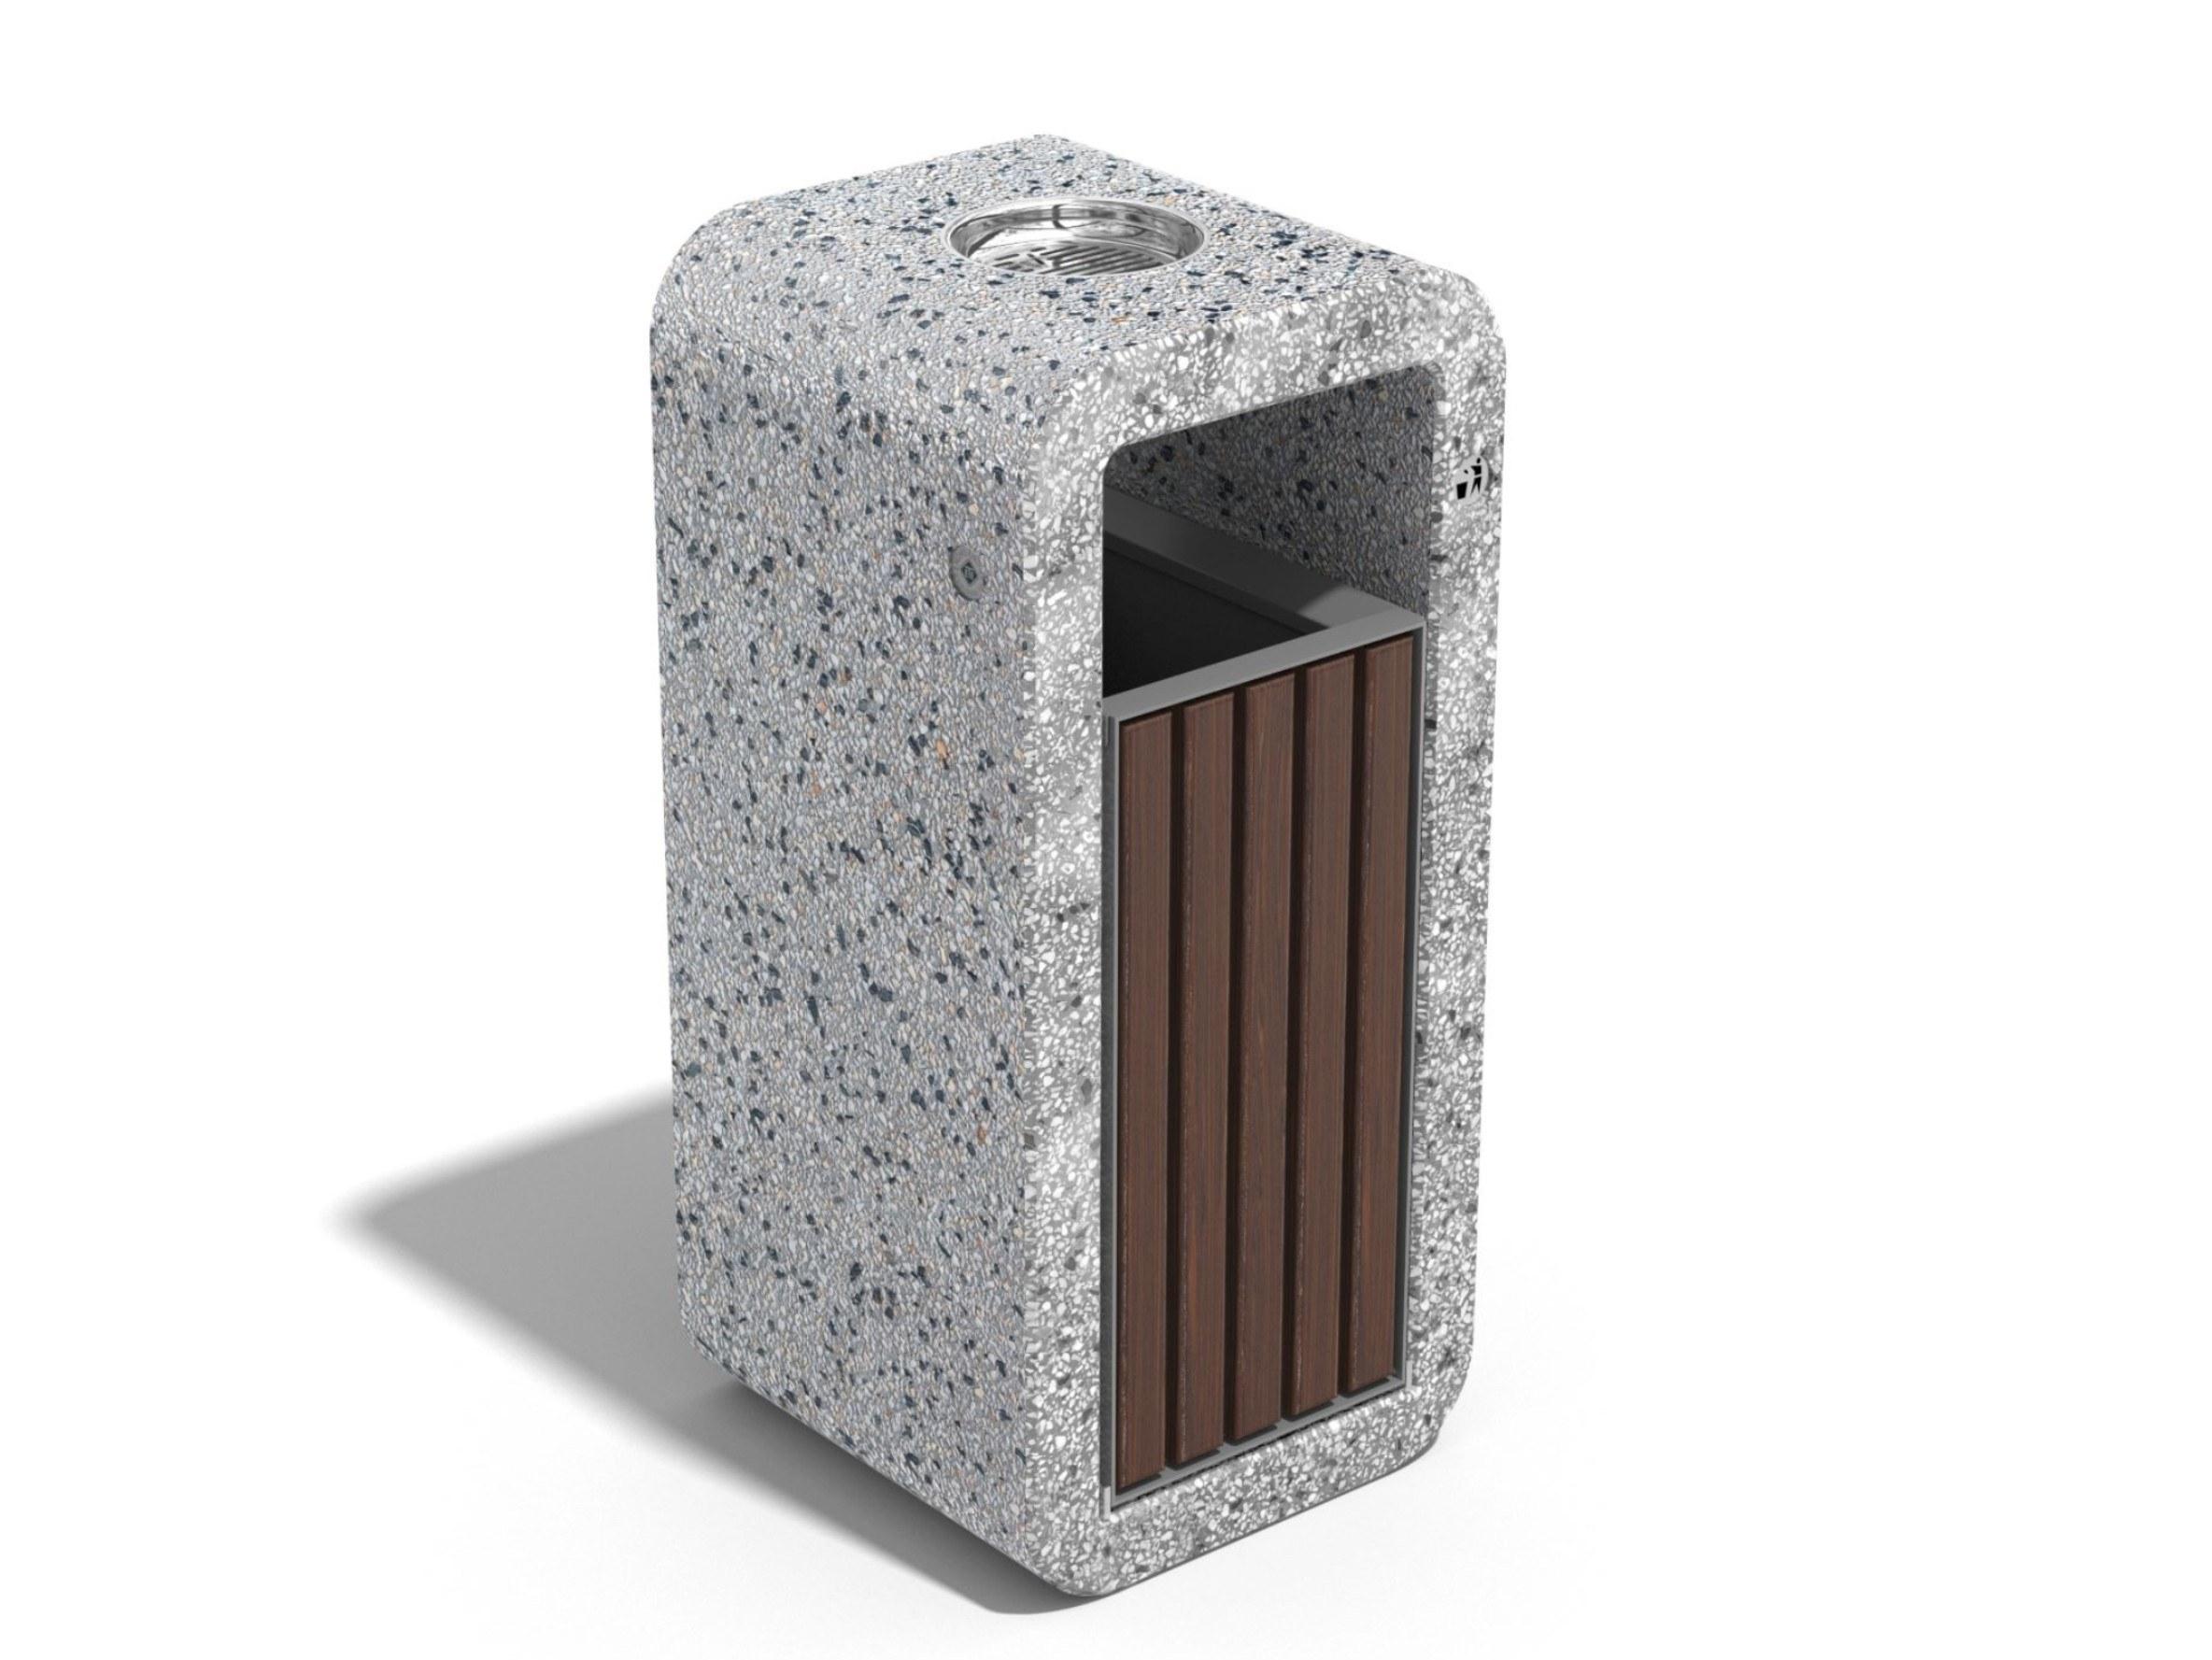 Урна 241 | Concrete litter bin